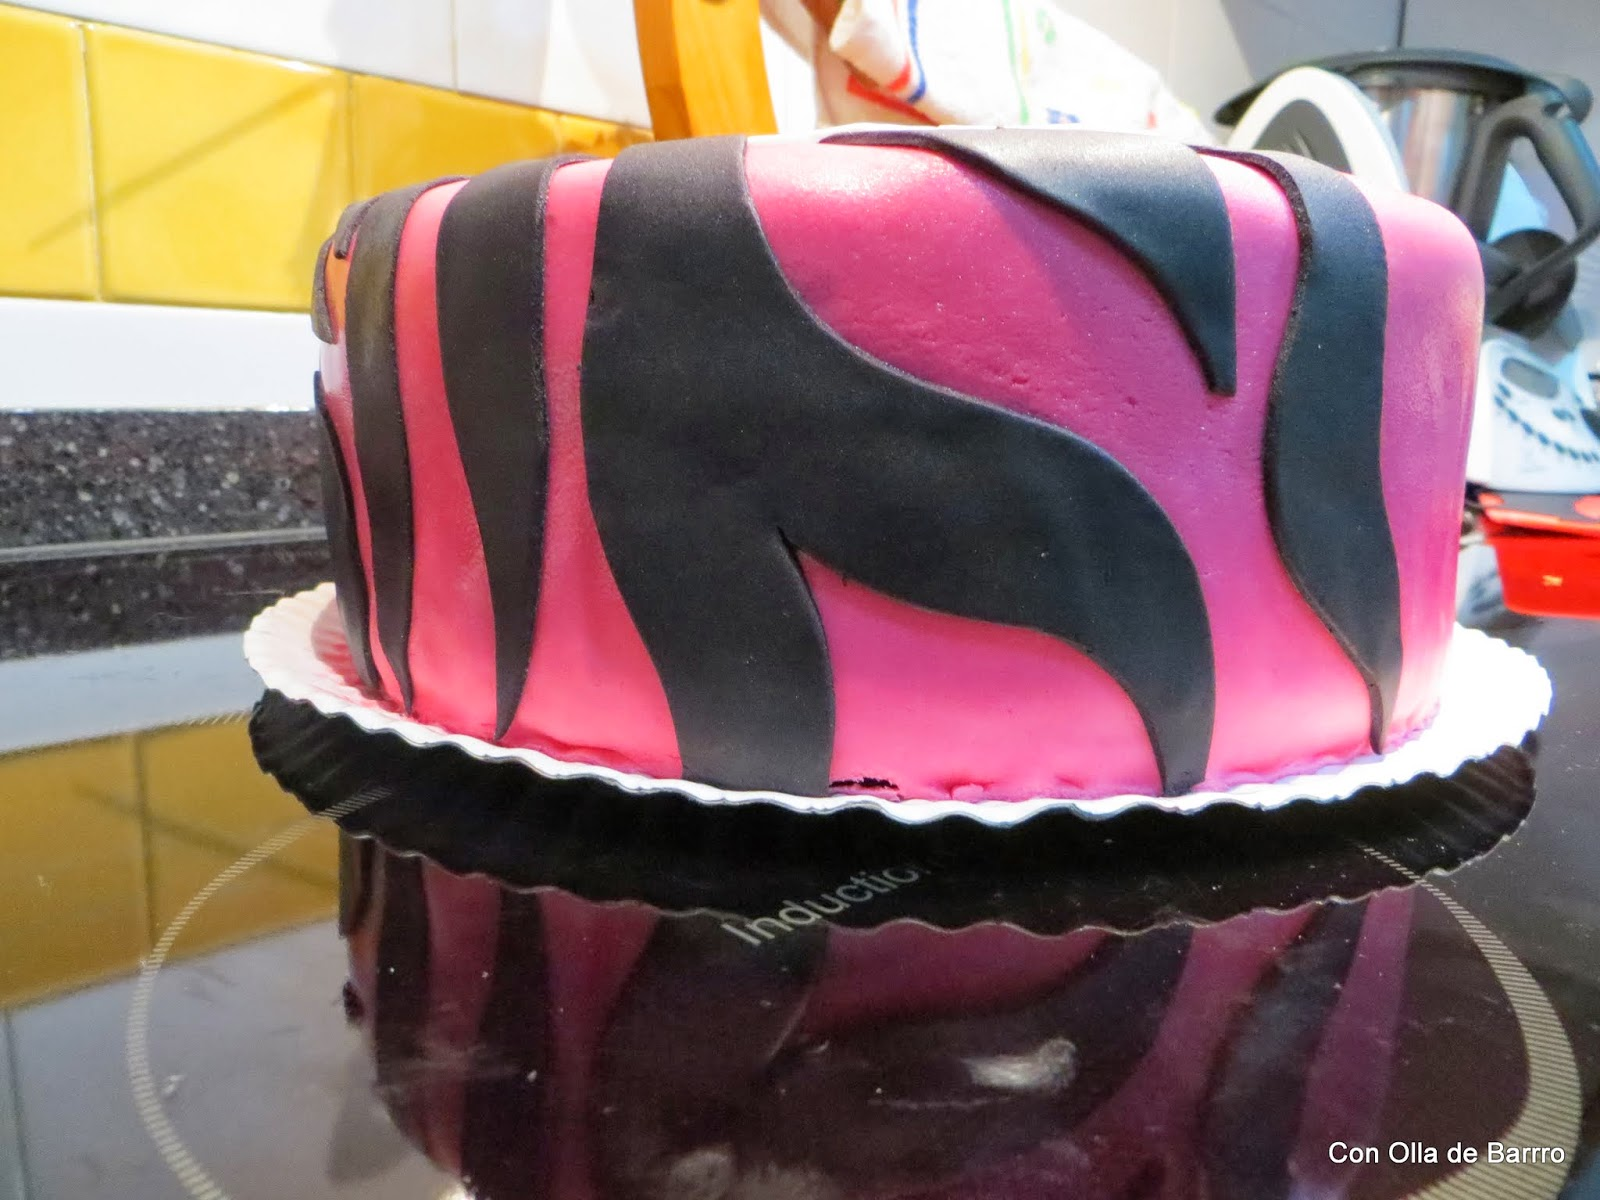 http://conolladebarro.blogspot.com.es/